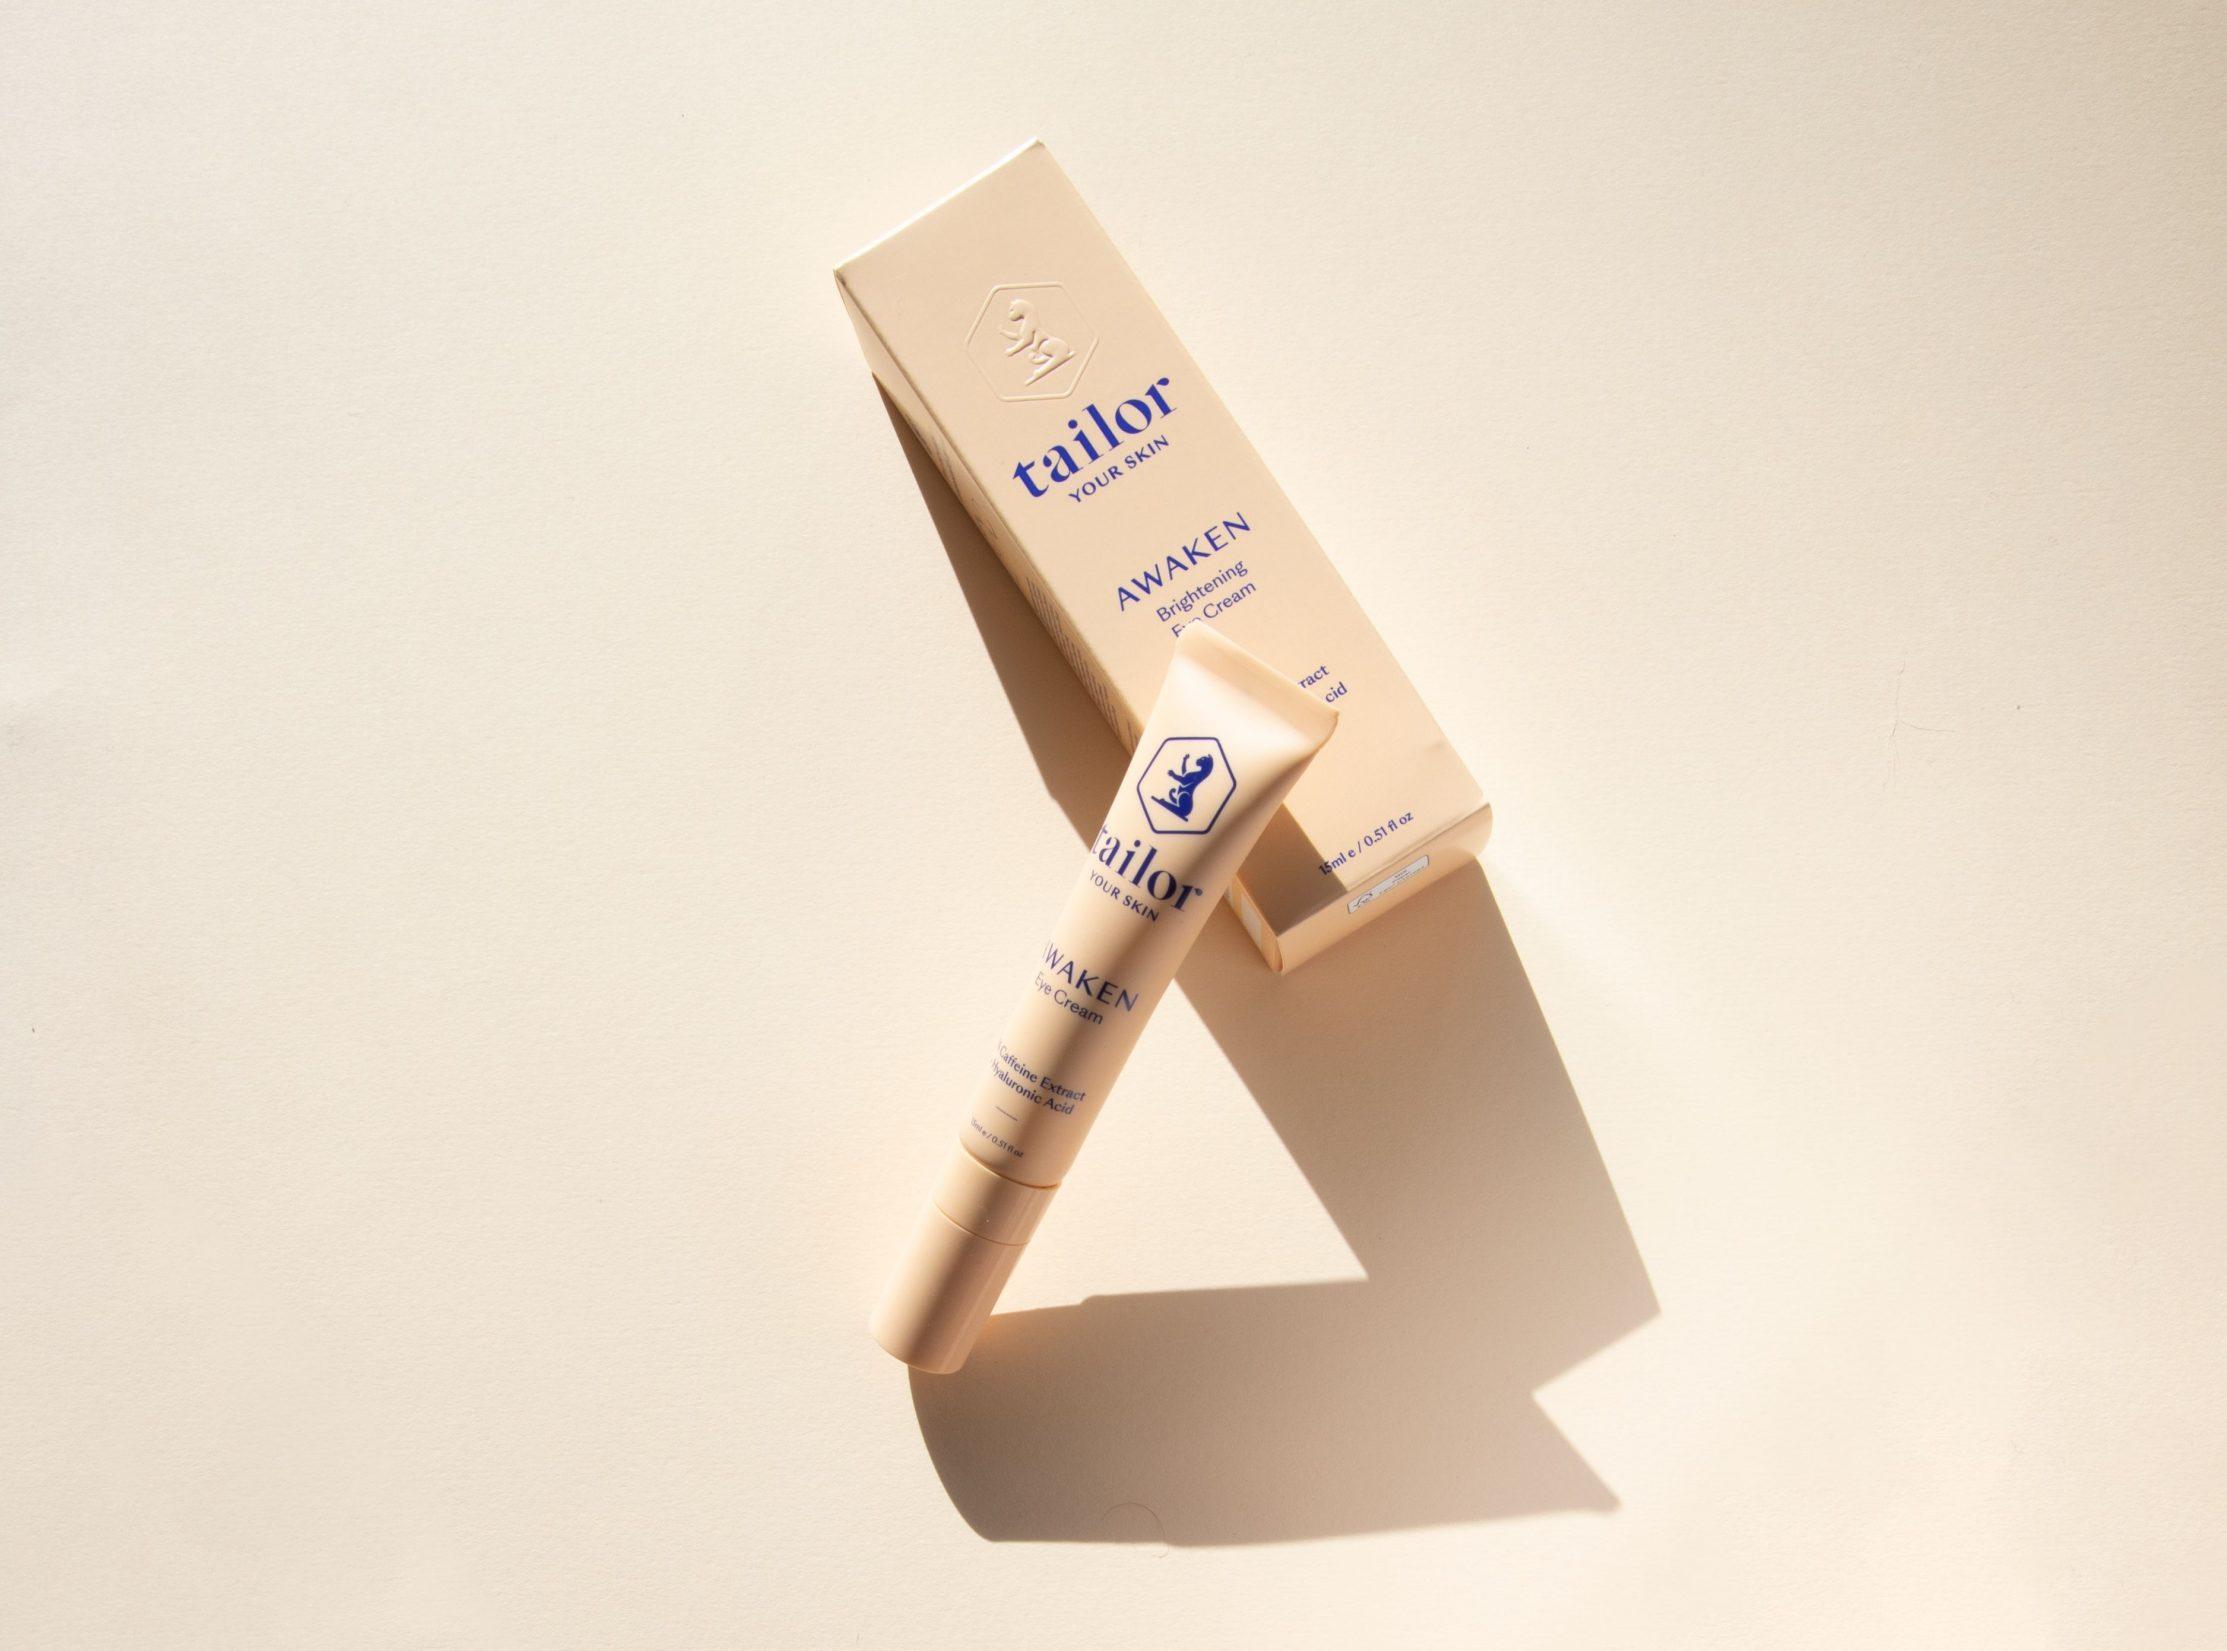 tailor skincare eyecream box and product shot